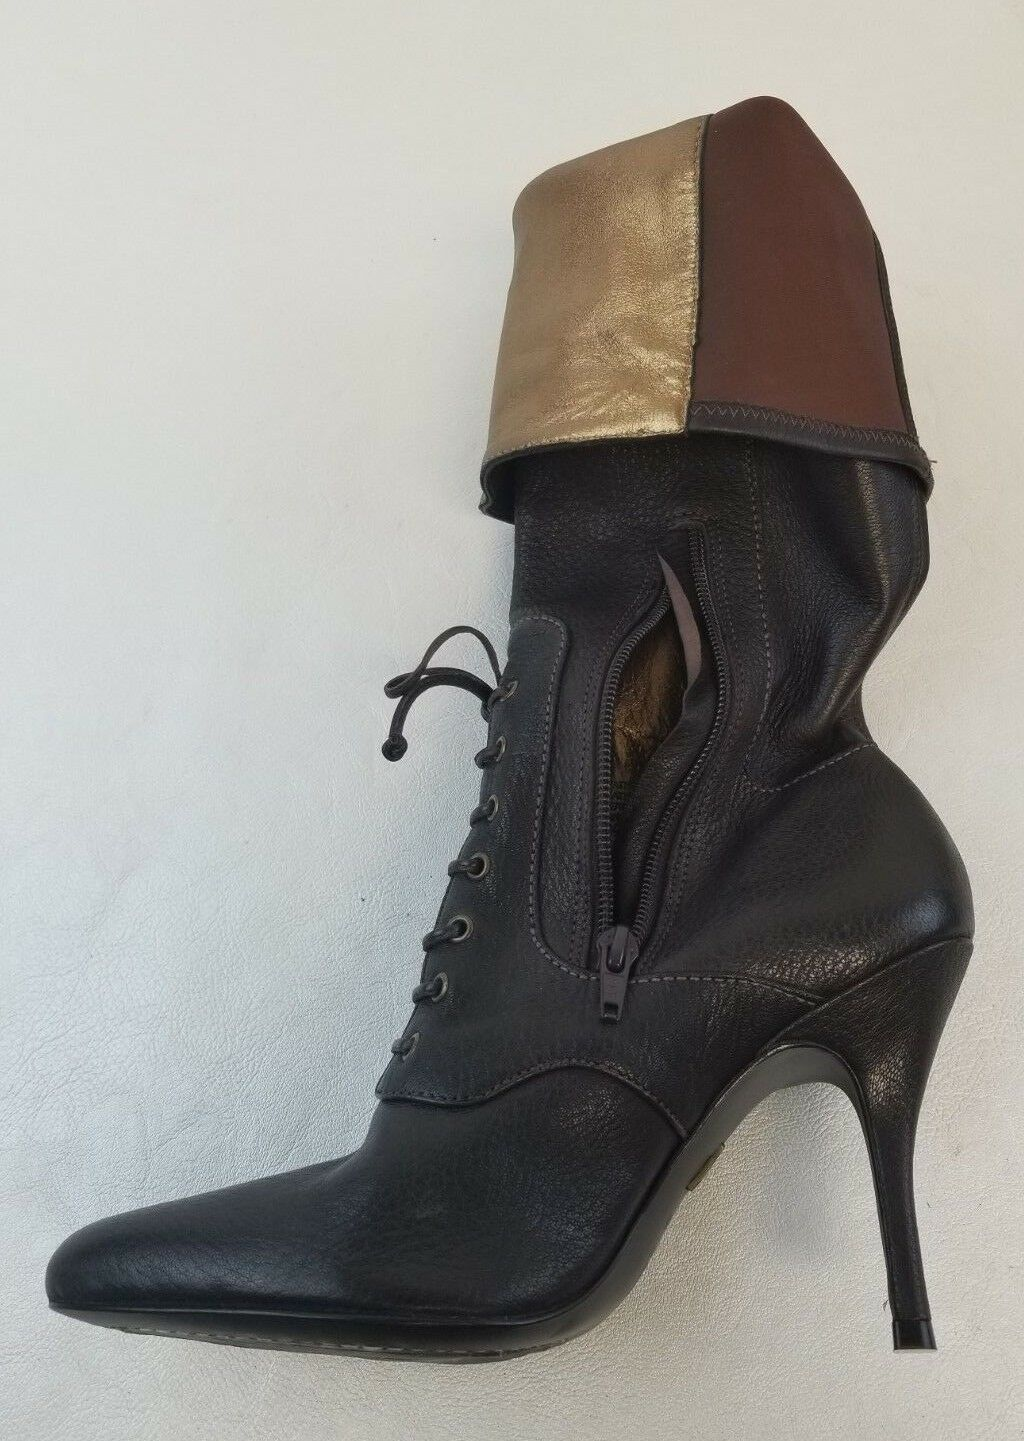 J. Vincent Damenschuhe Palace Mid Calf Stiefel Zip Pointy Toe Damenschuhe Vincent Braun Leder Lace Up 7M 73fdd8